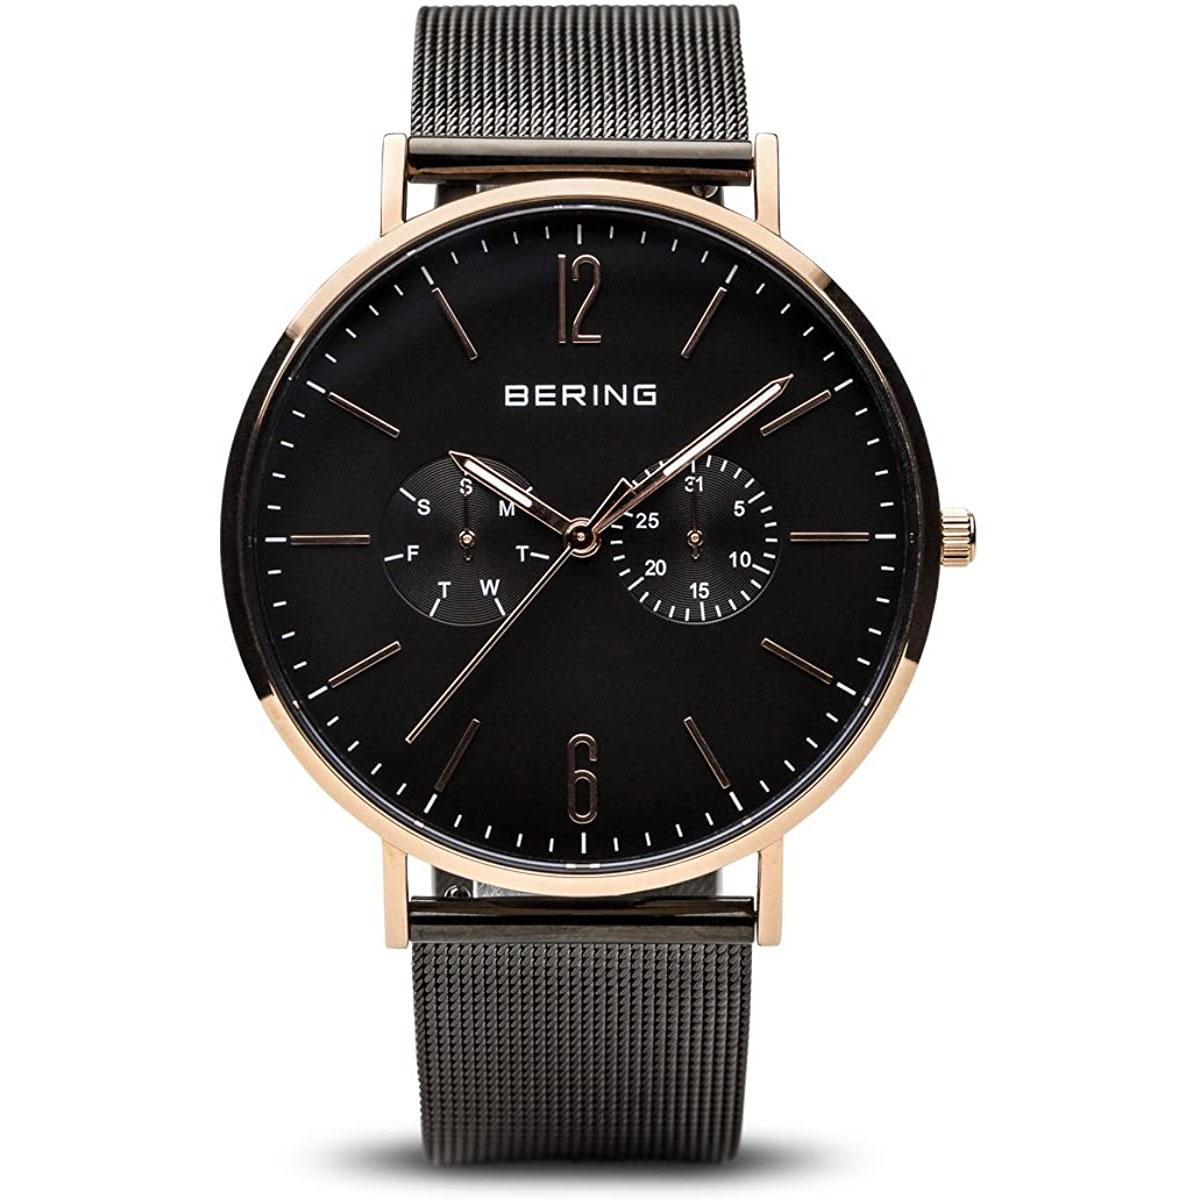 BERING-Herren-Analog-Quarz-Uhr-mit-Edelstahl-Armband-14240-163